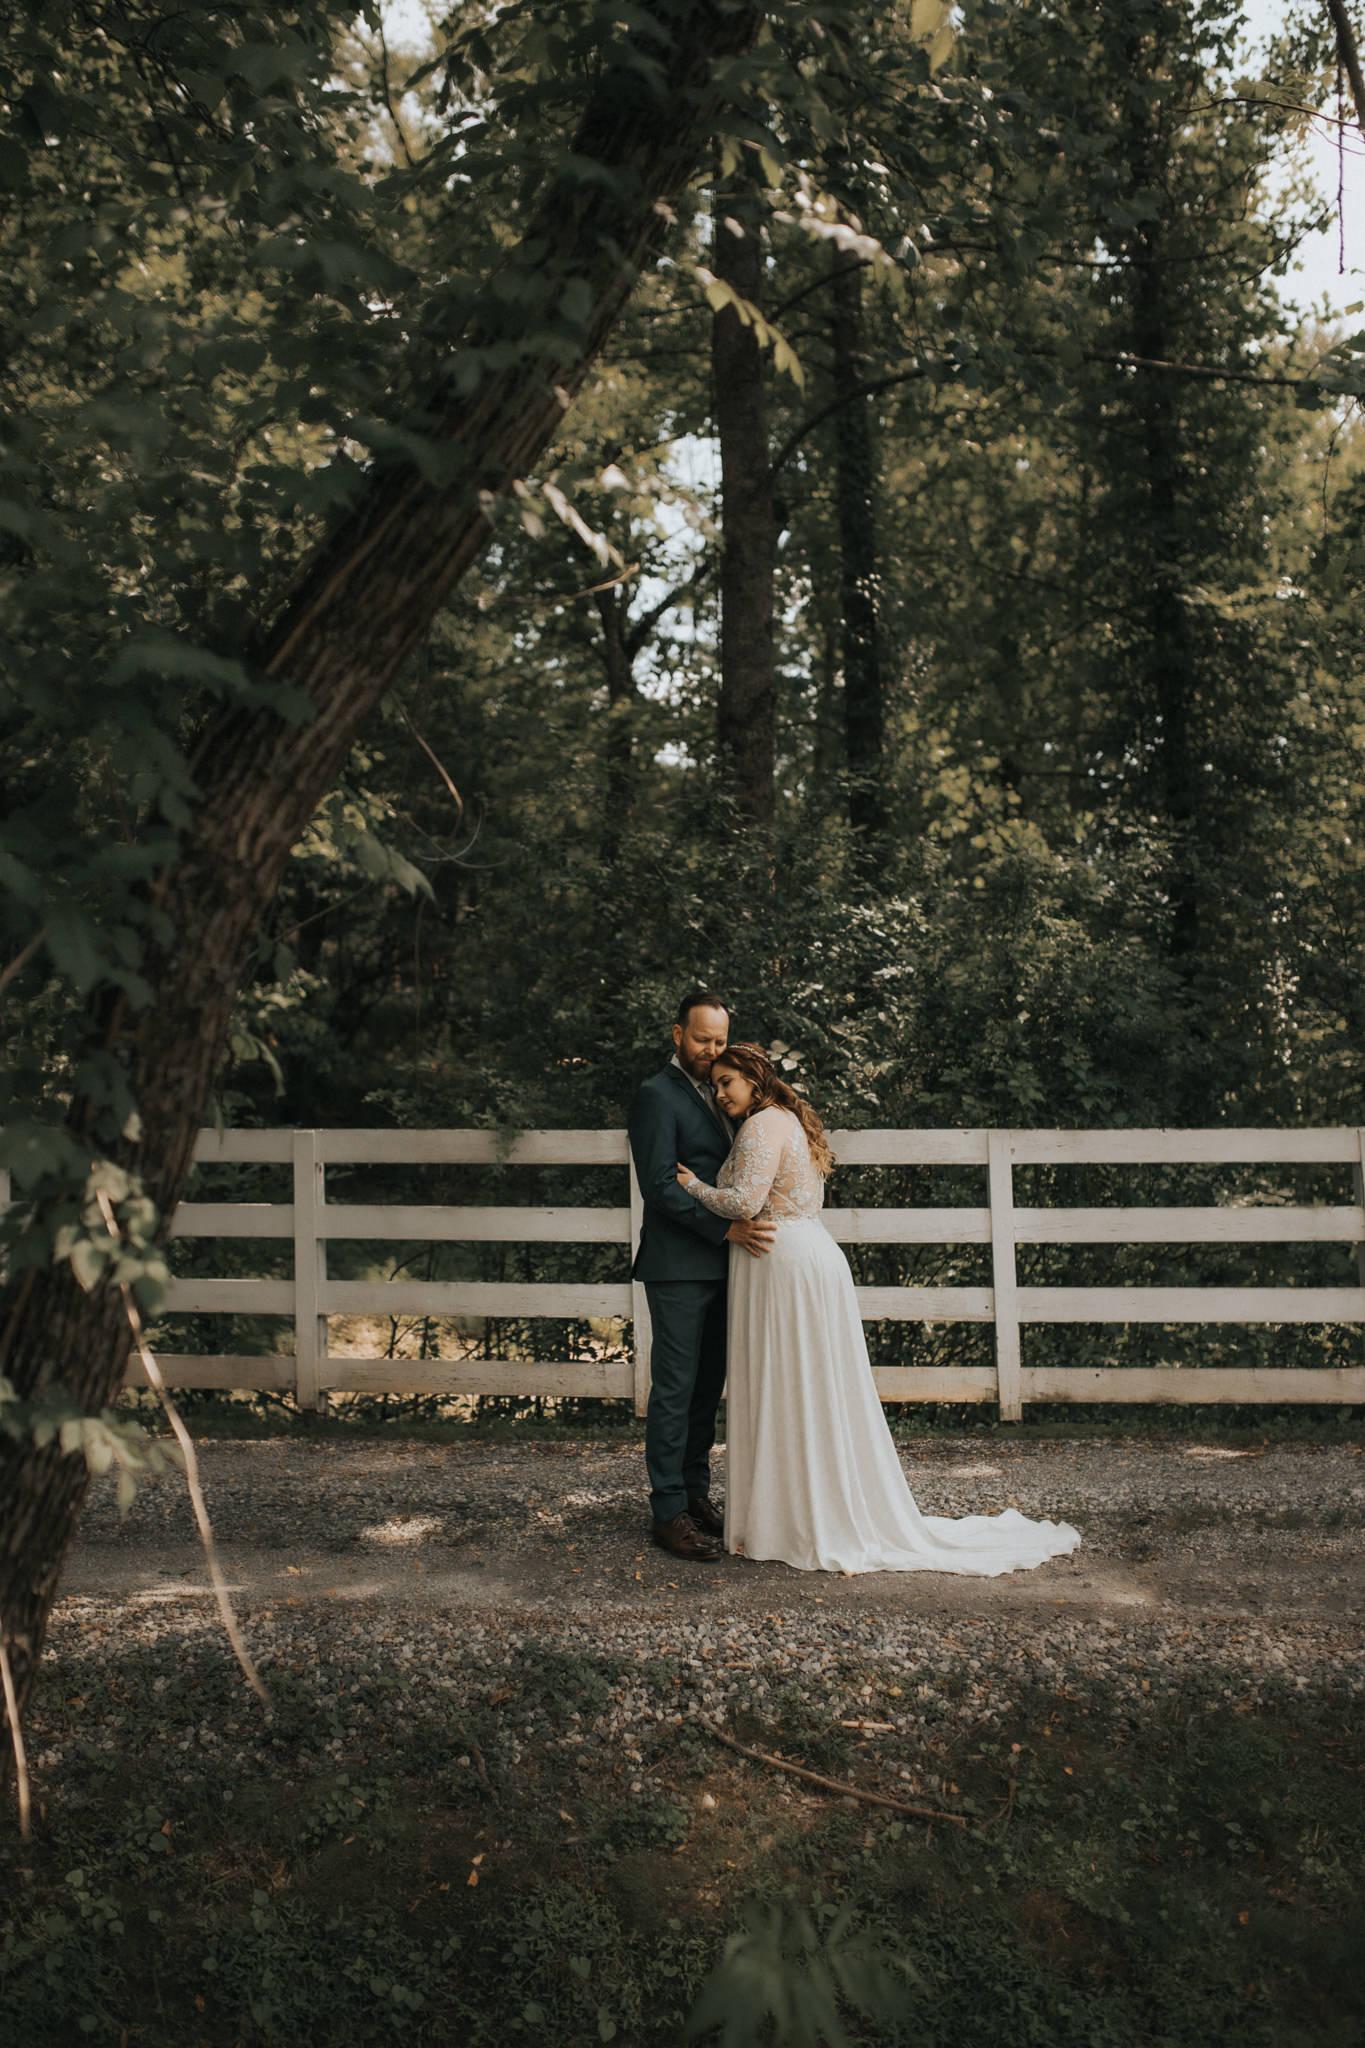 KateMatt-North-Georgia-Wedding-Photographer-Mountain-Laurel-Farm-45.jpg